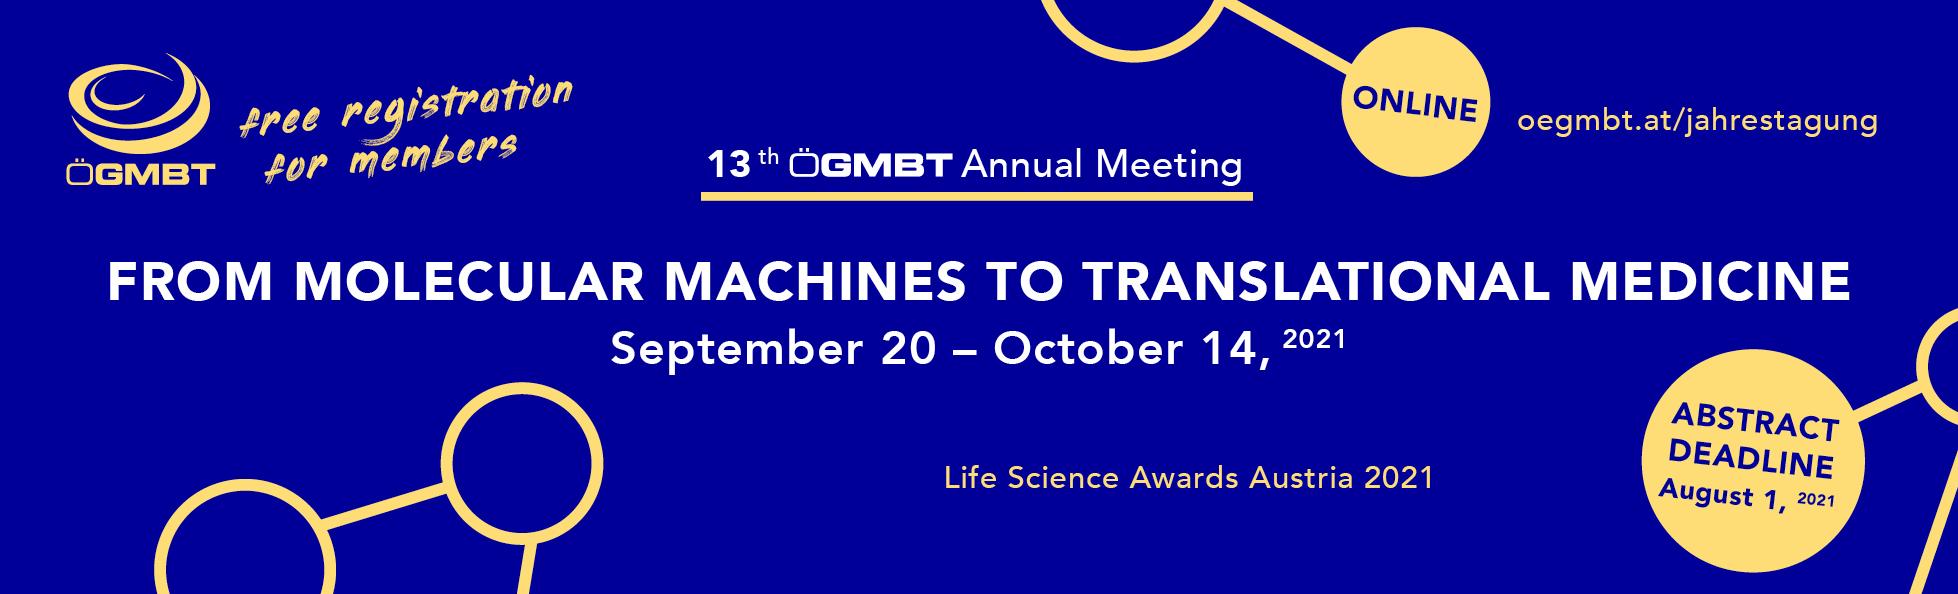 ÖGMBT Annual meeting Banner